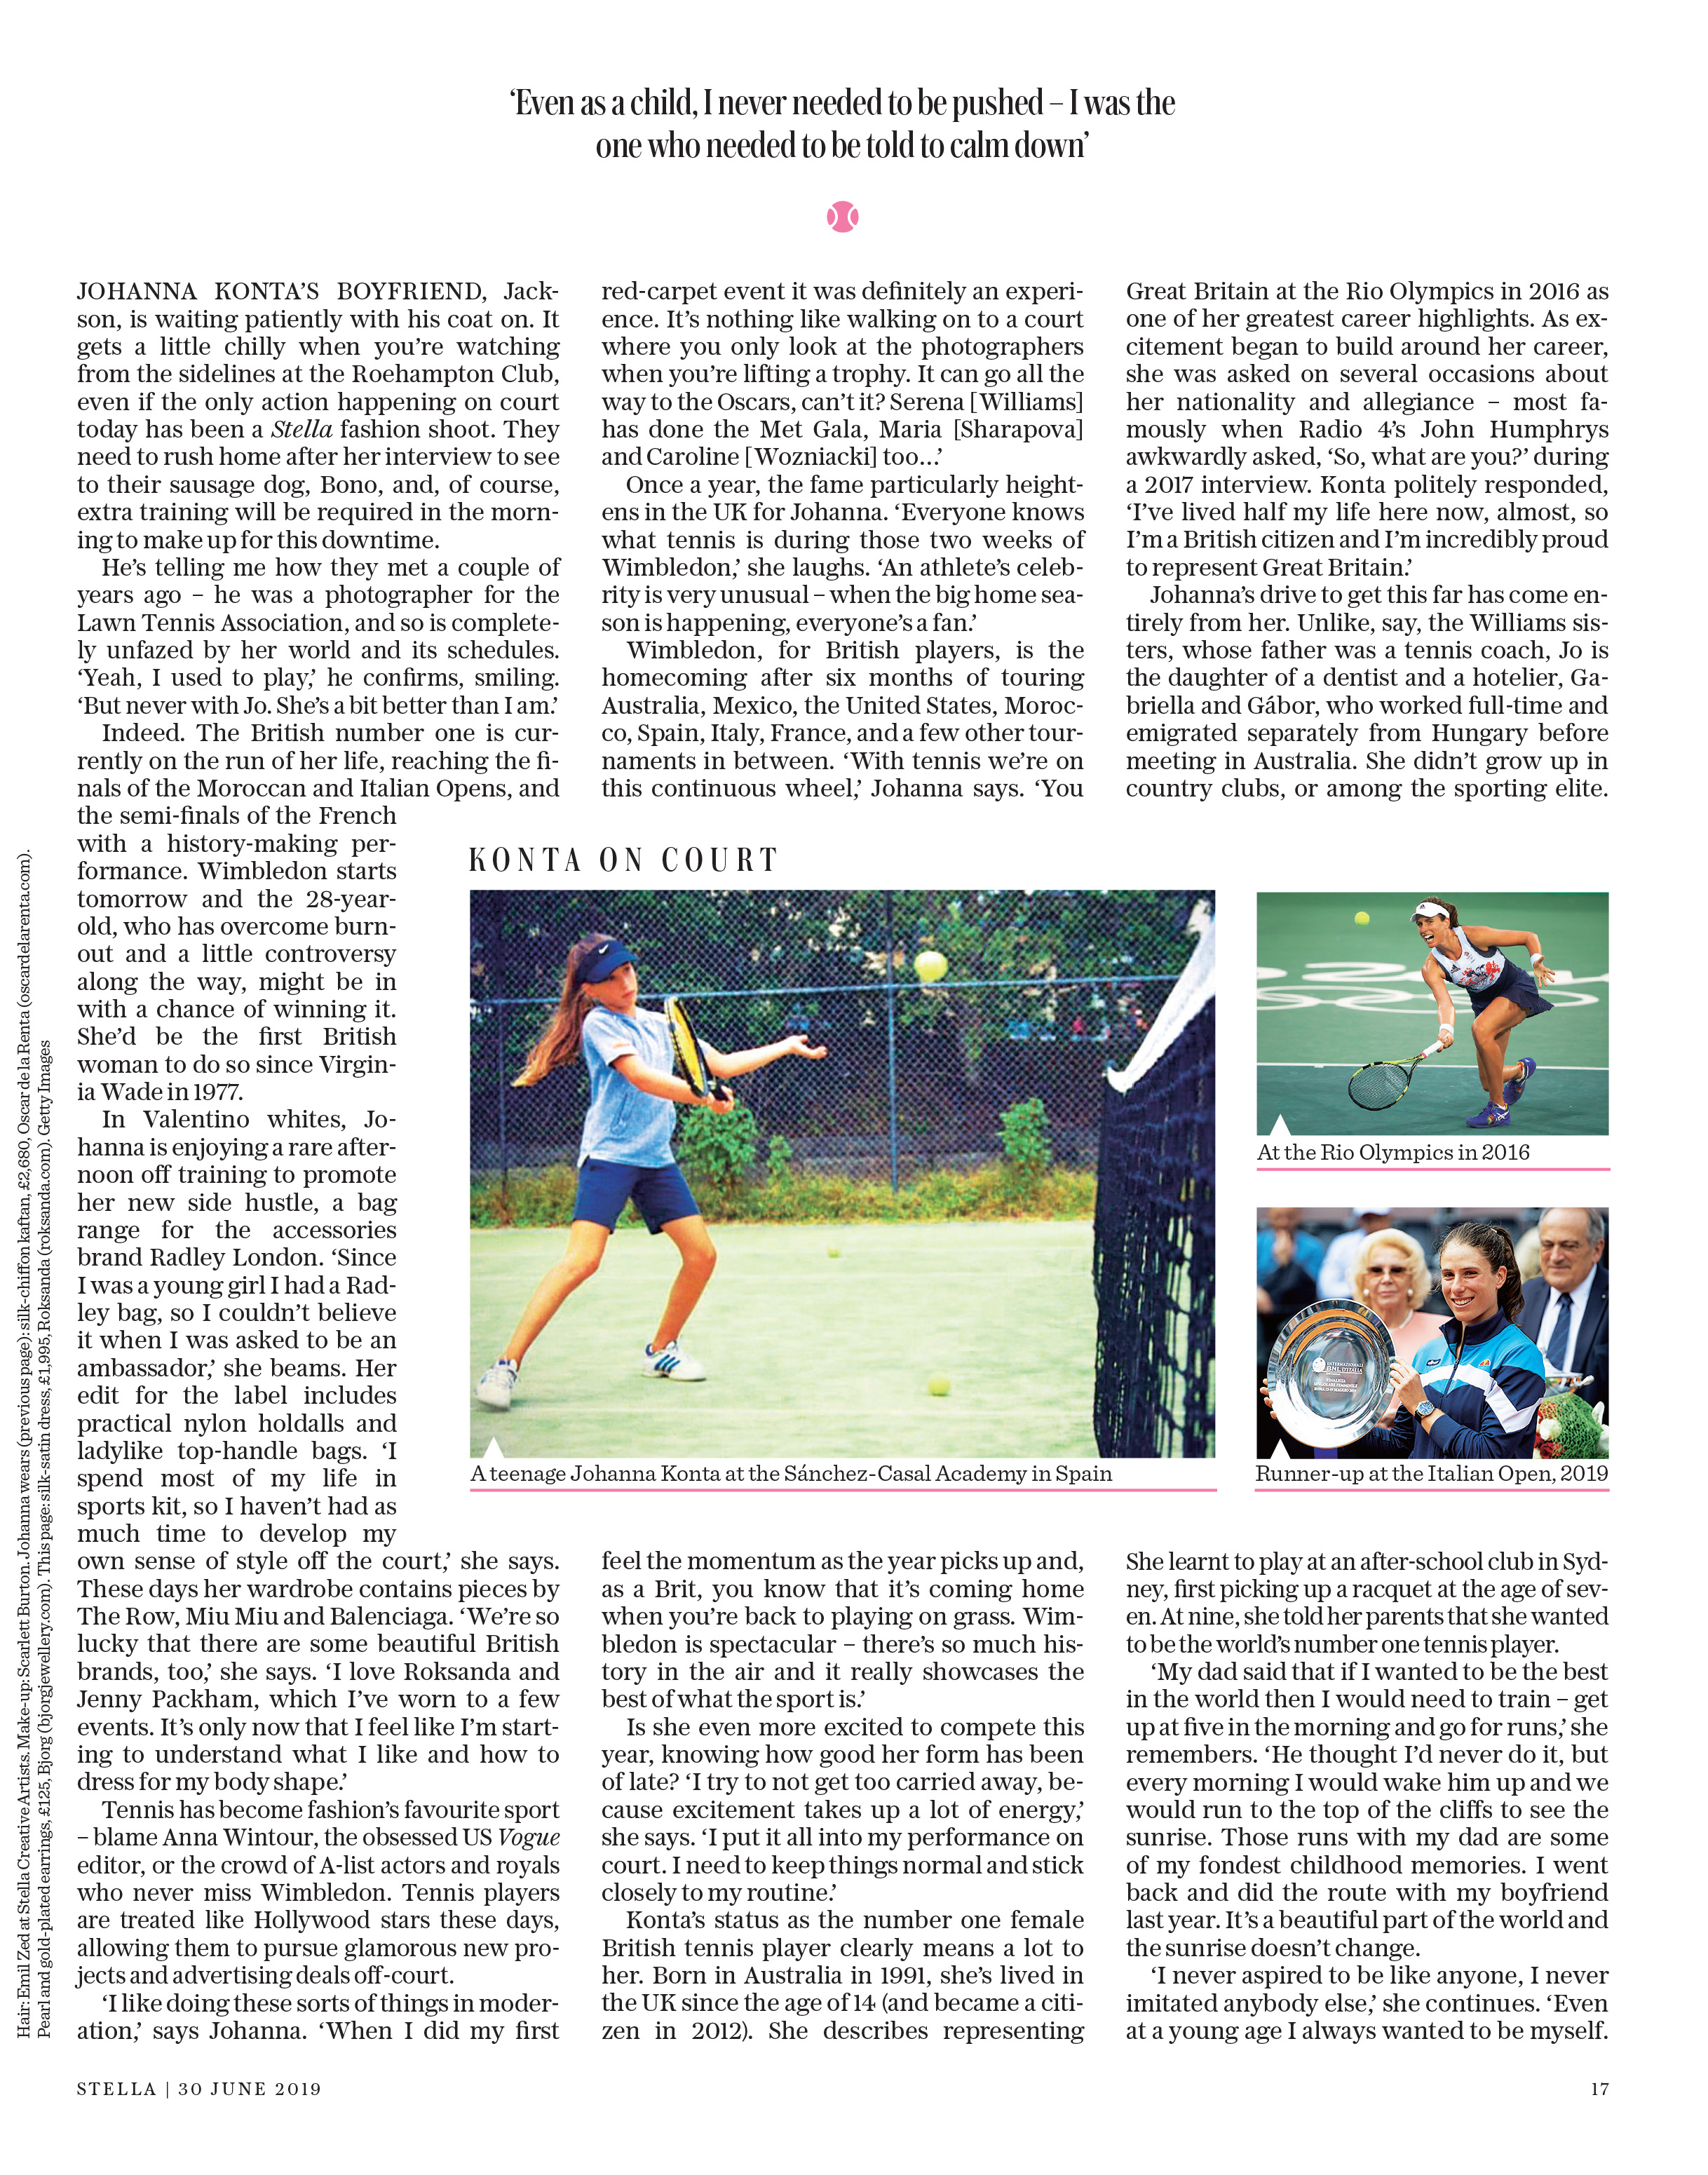 JO KONTA2Sunday Telegraph Magazine_30-06-2019_Main_1st_p17